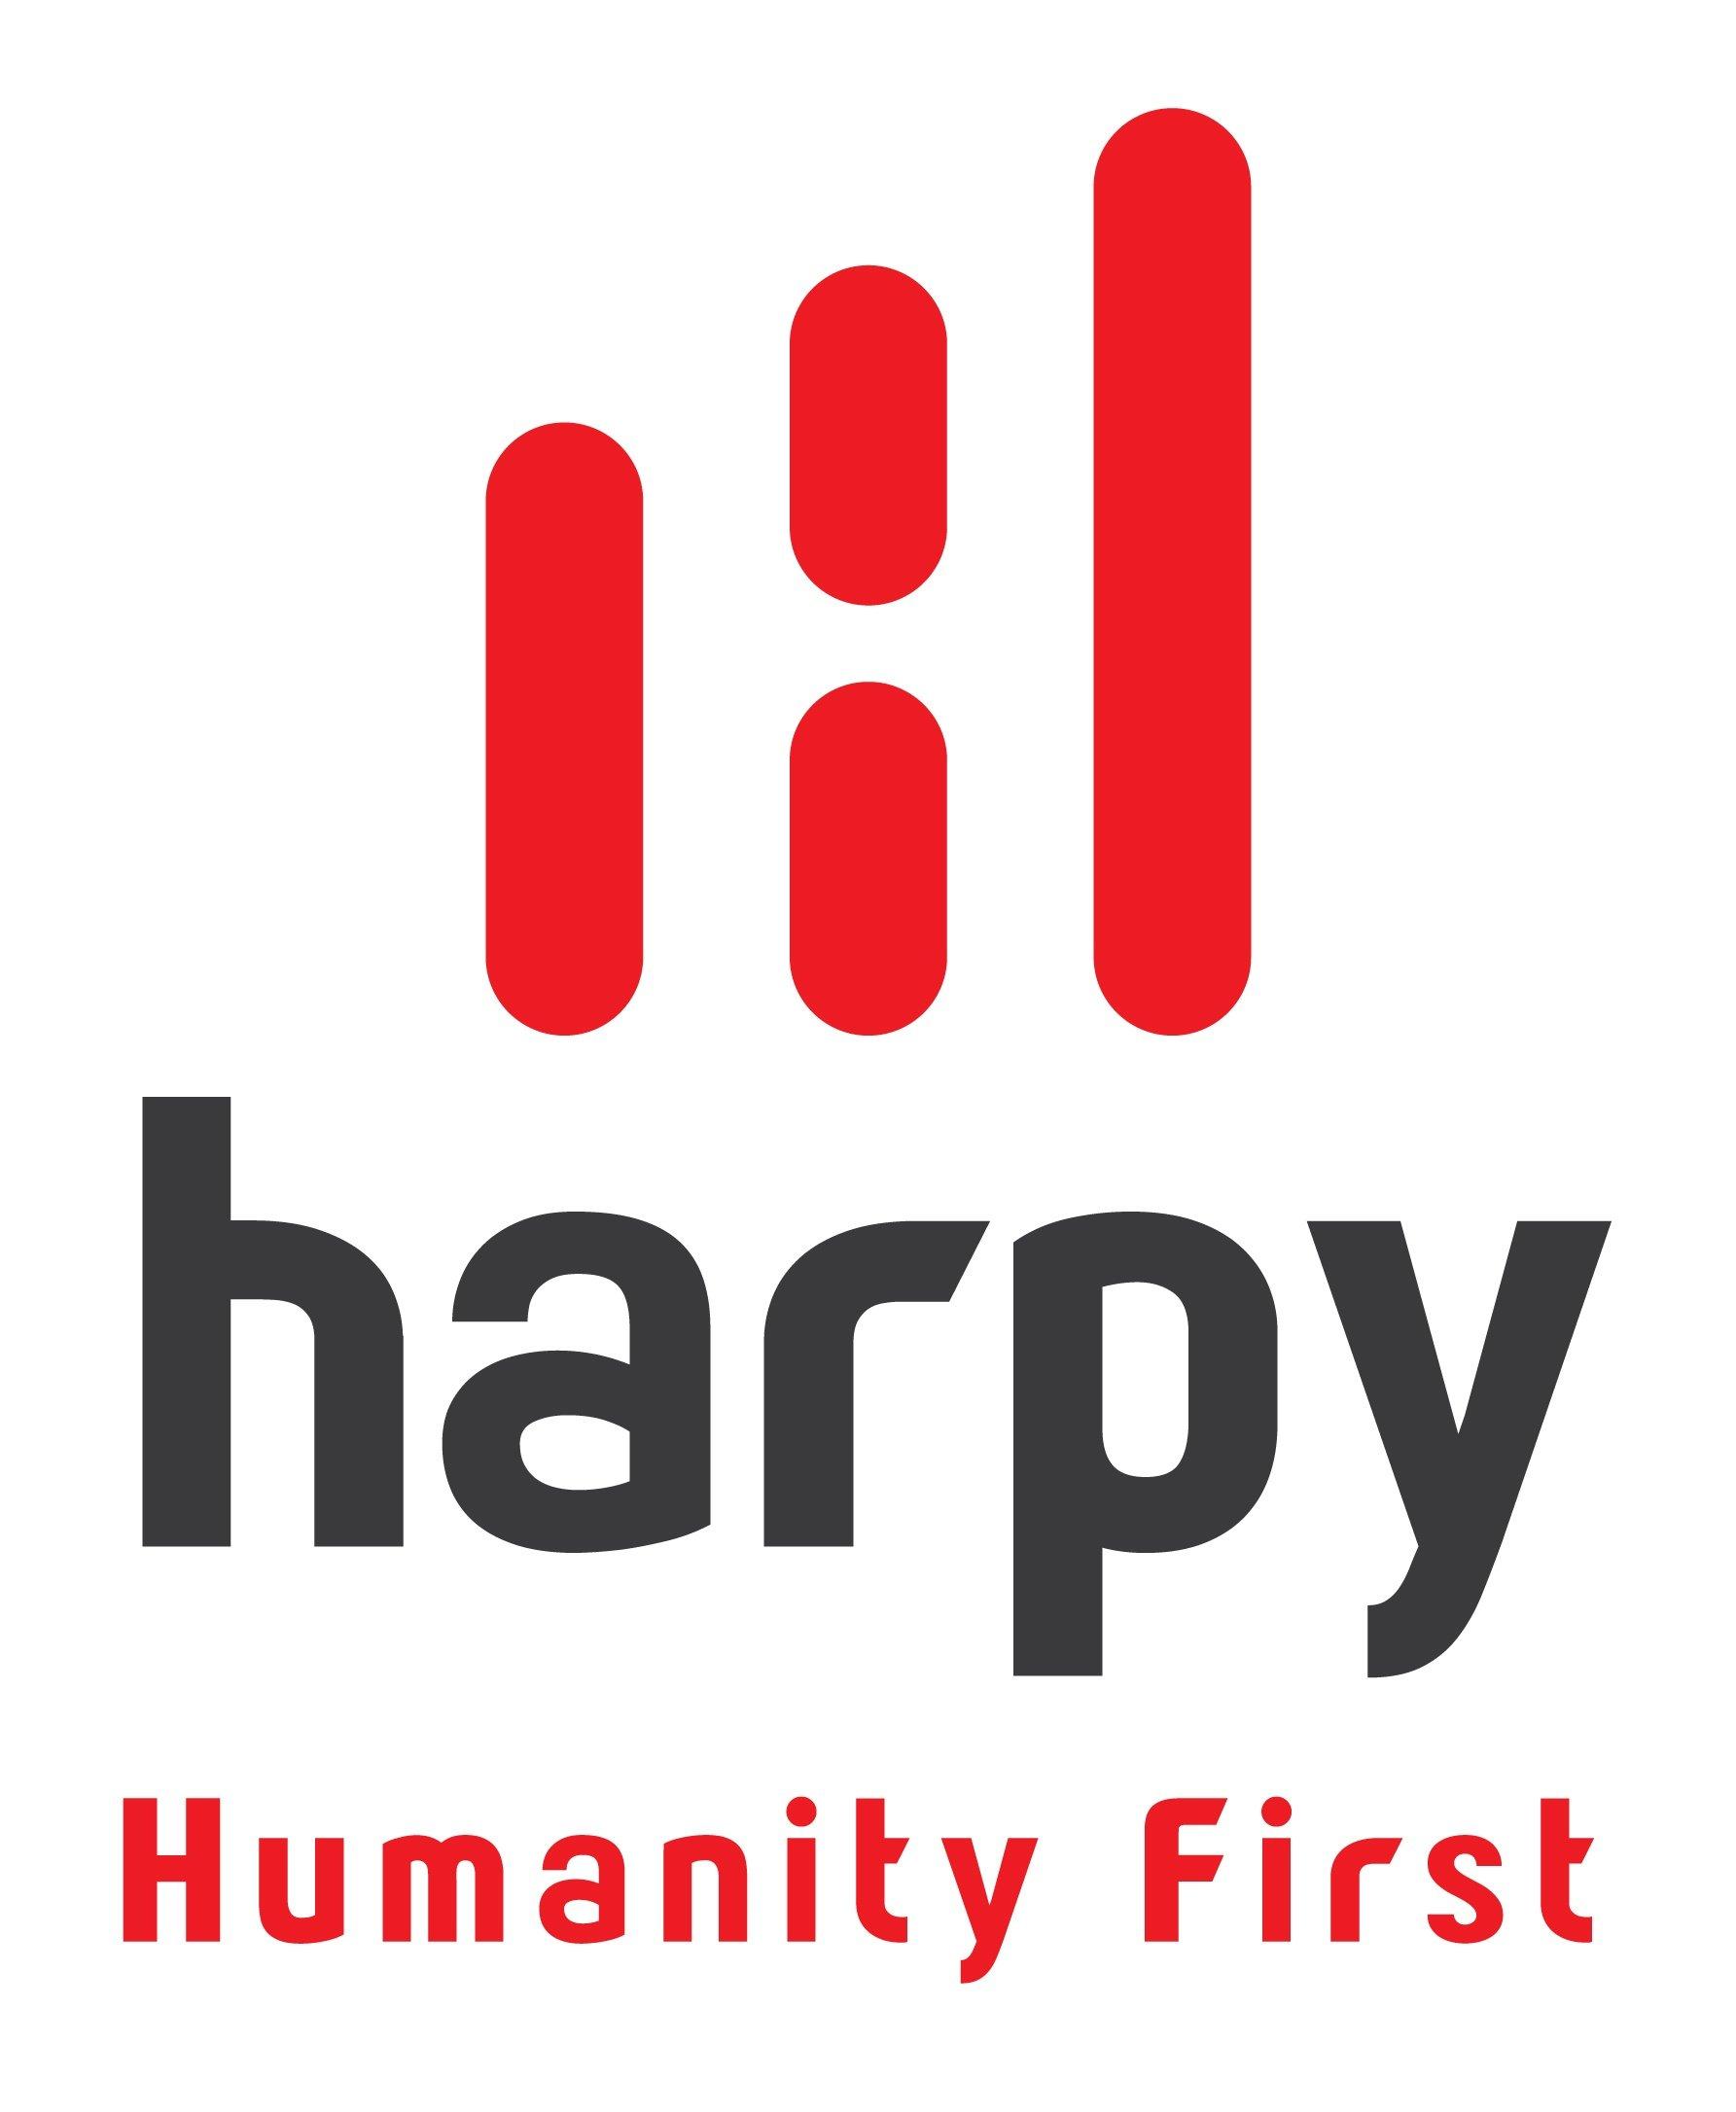 Harpy Core Network